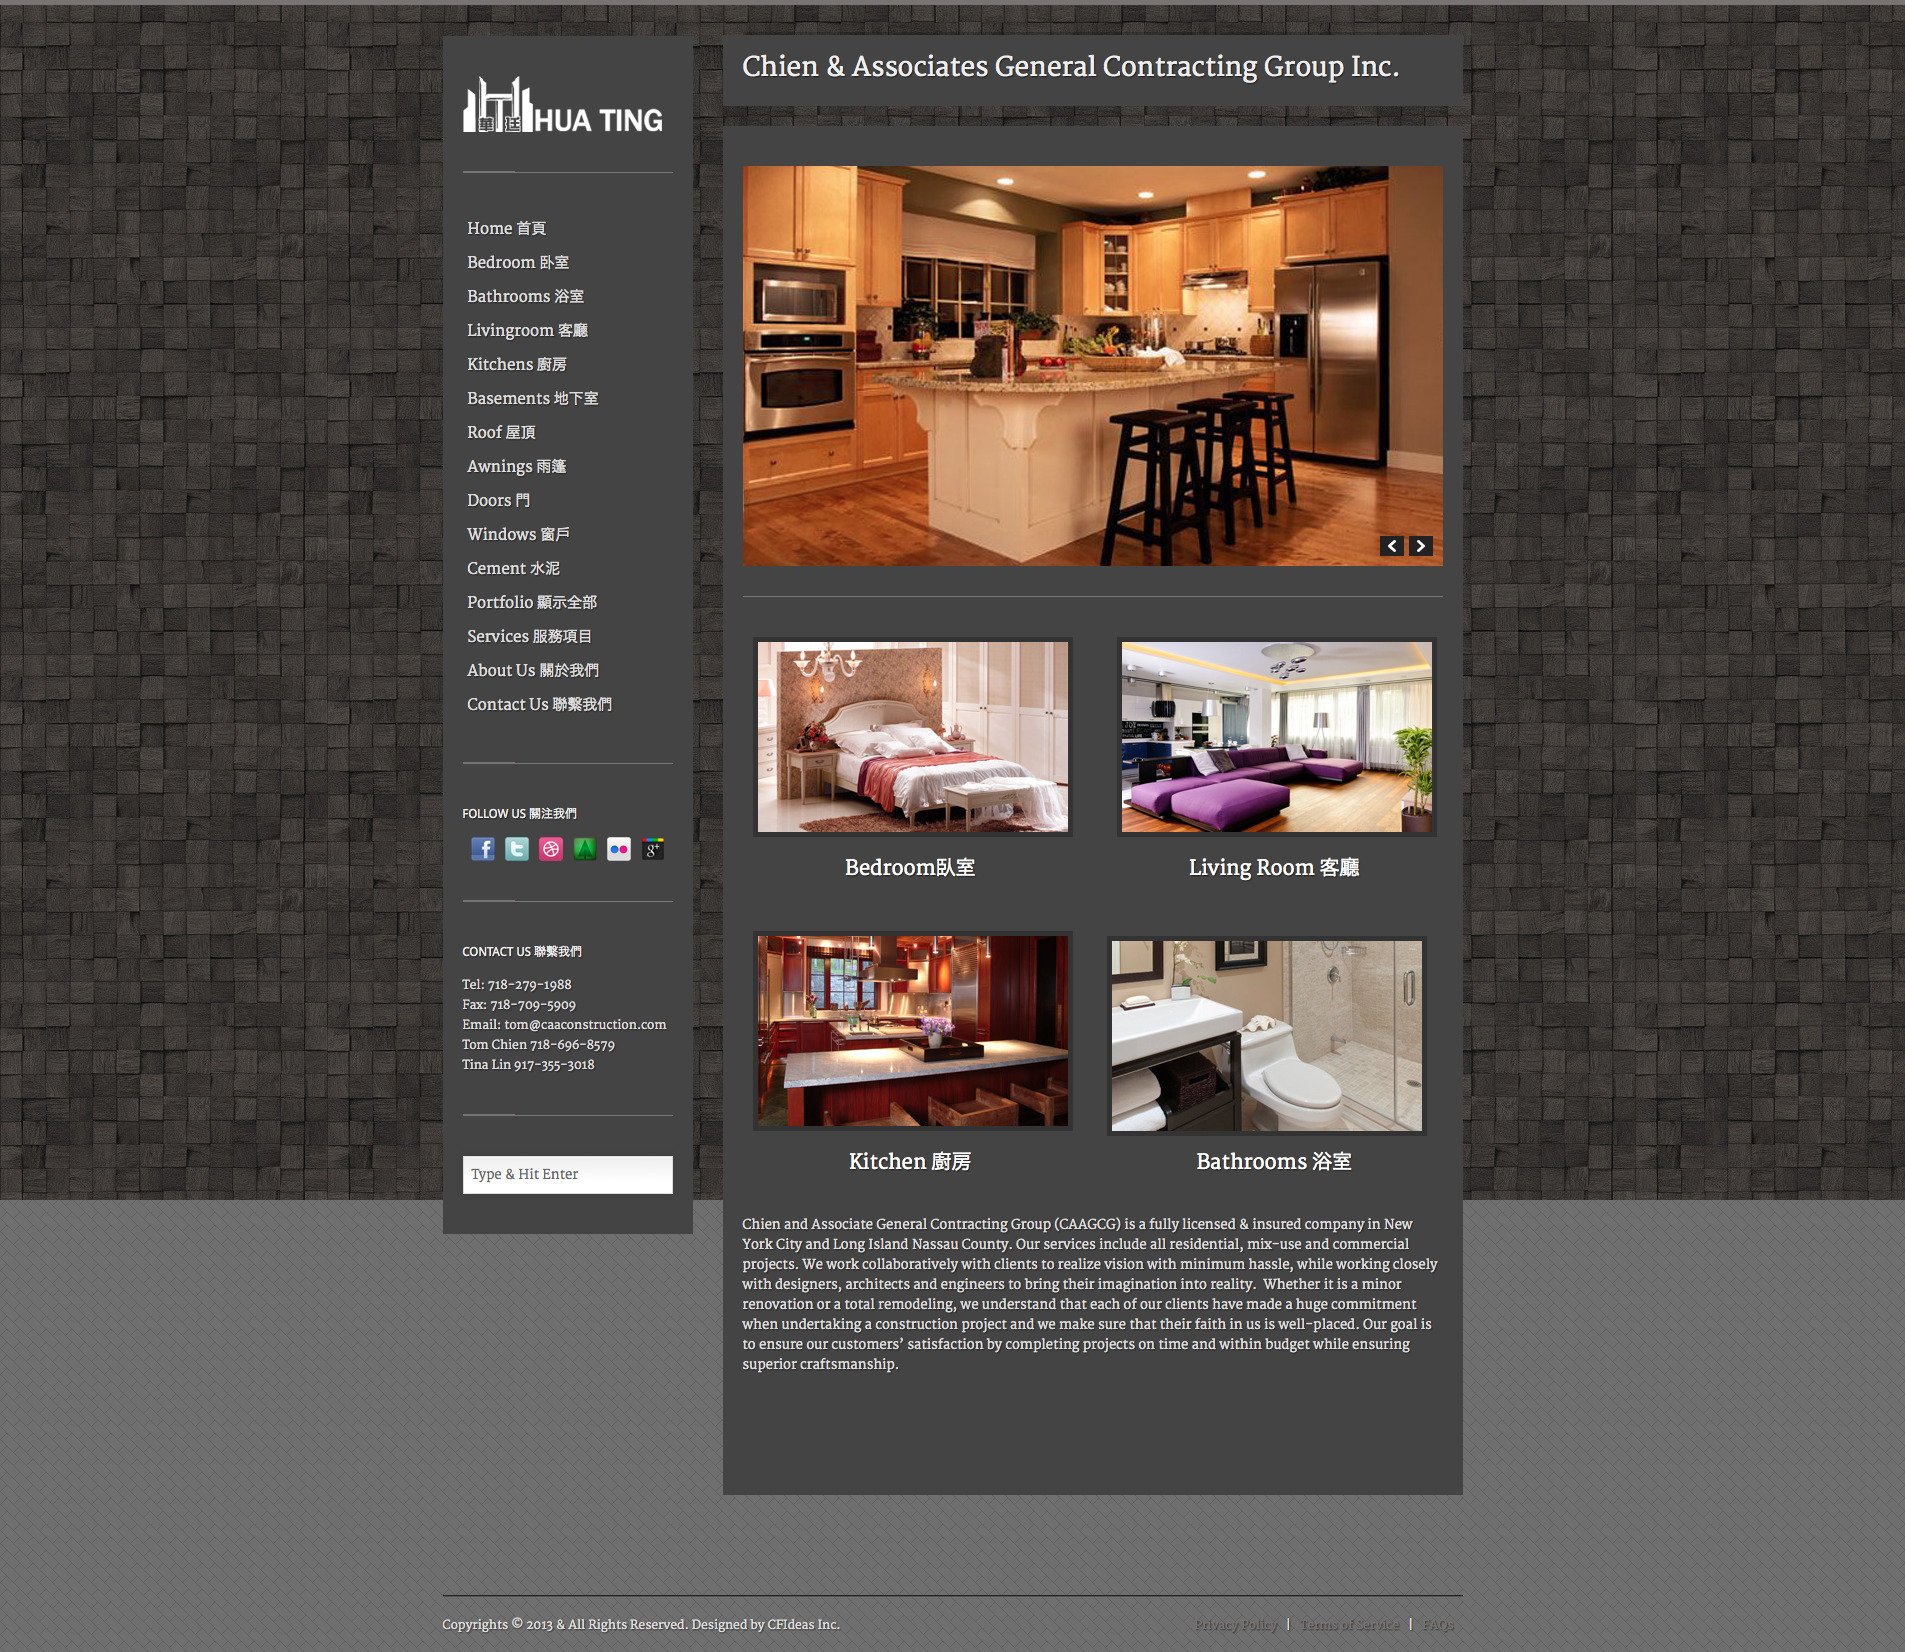 Real Estate 卡菲科技 Cfideas 纽约网页设计公司 718 961 2930